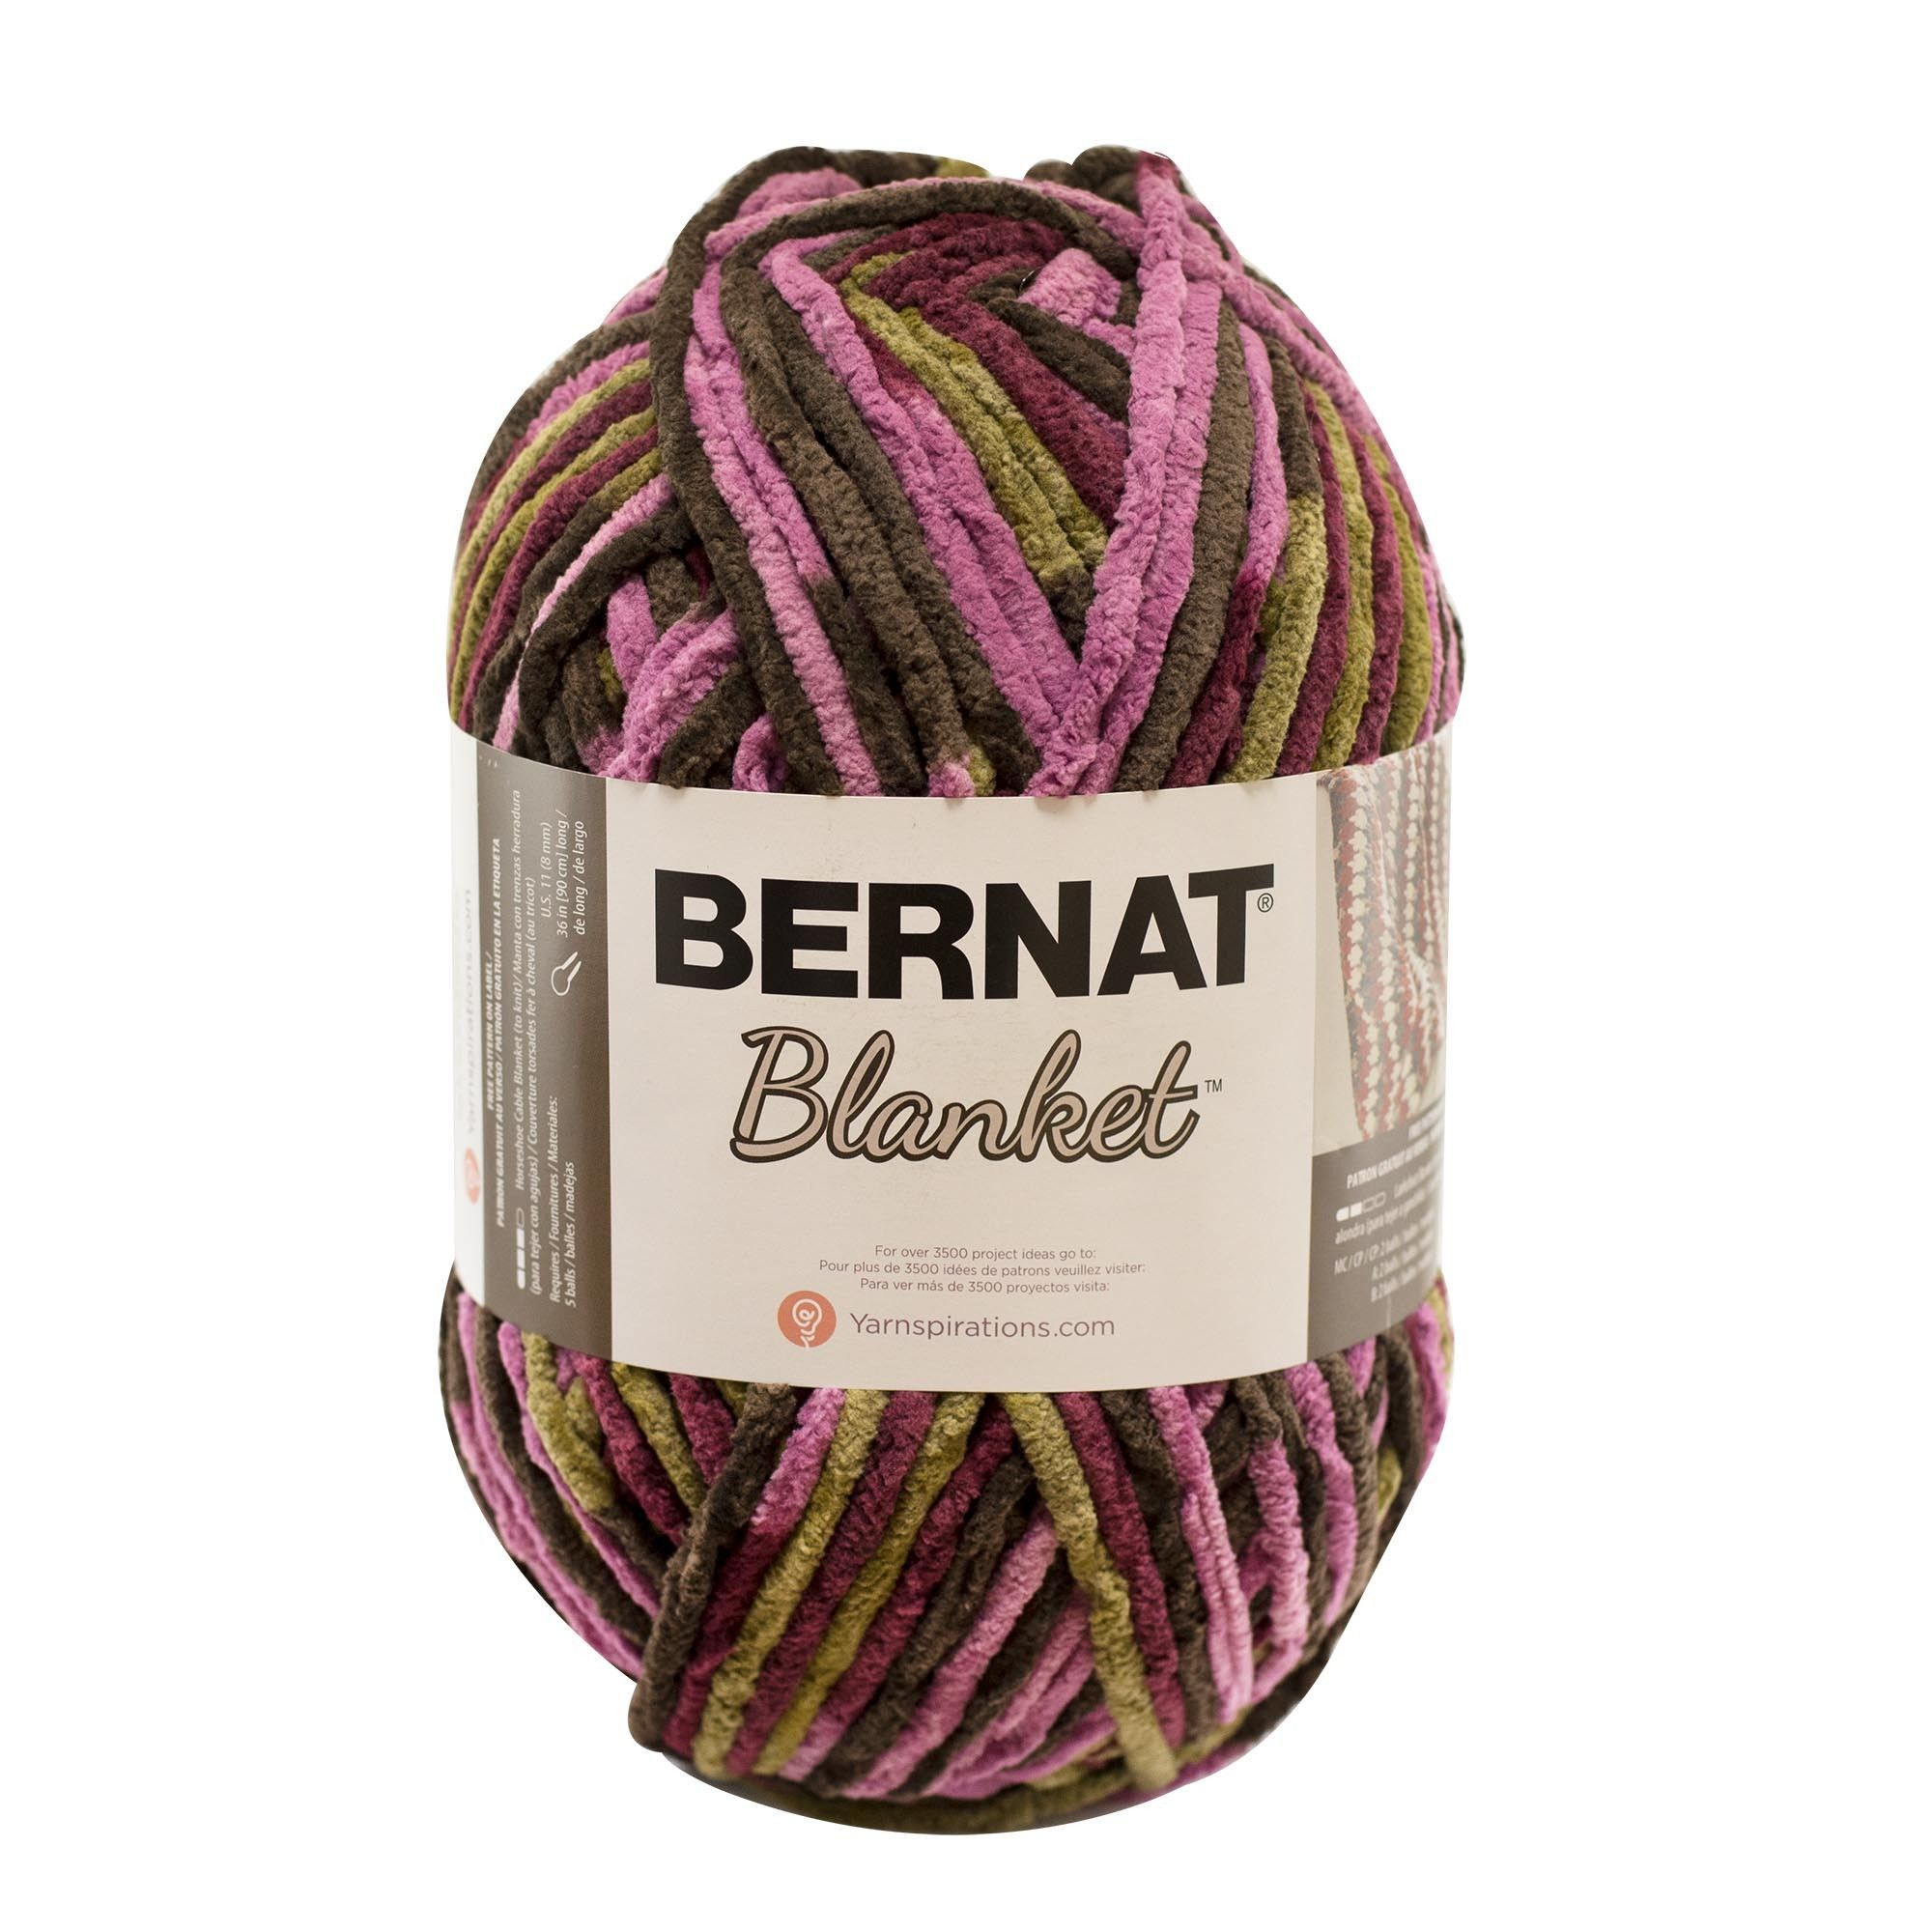 Bernat Blanket Yarn Plum Chutney (With images) | Bernat ...